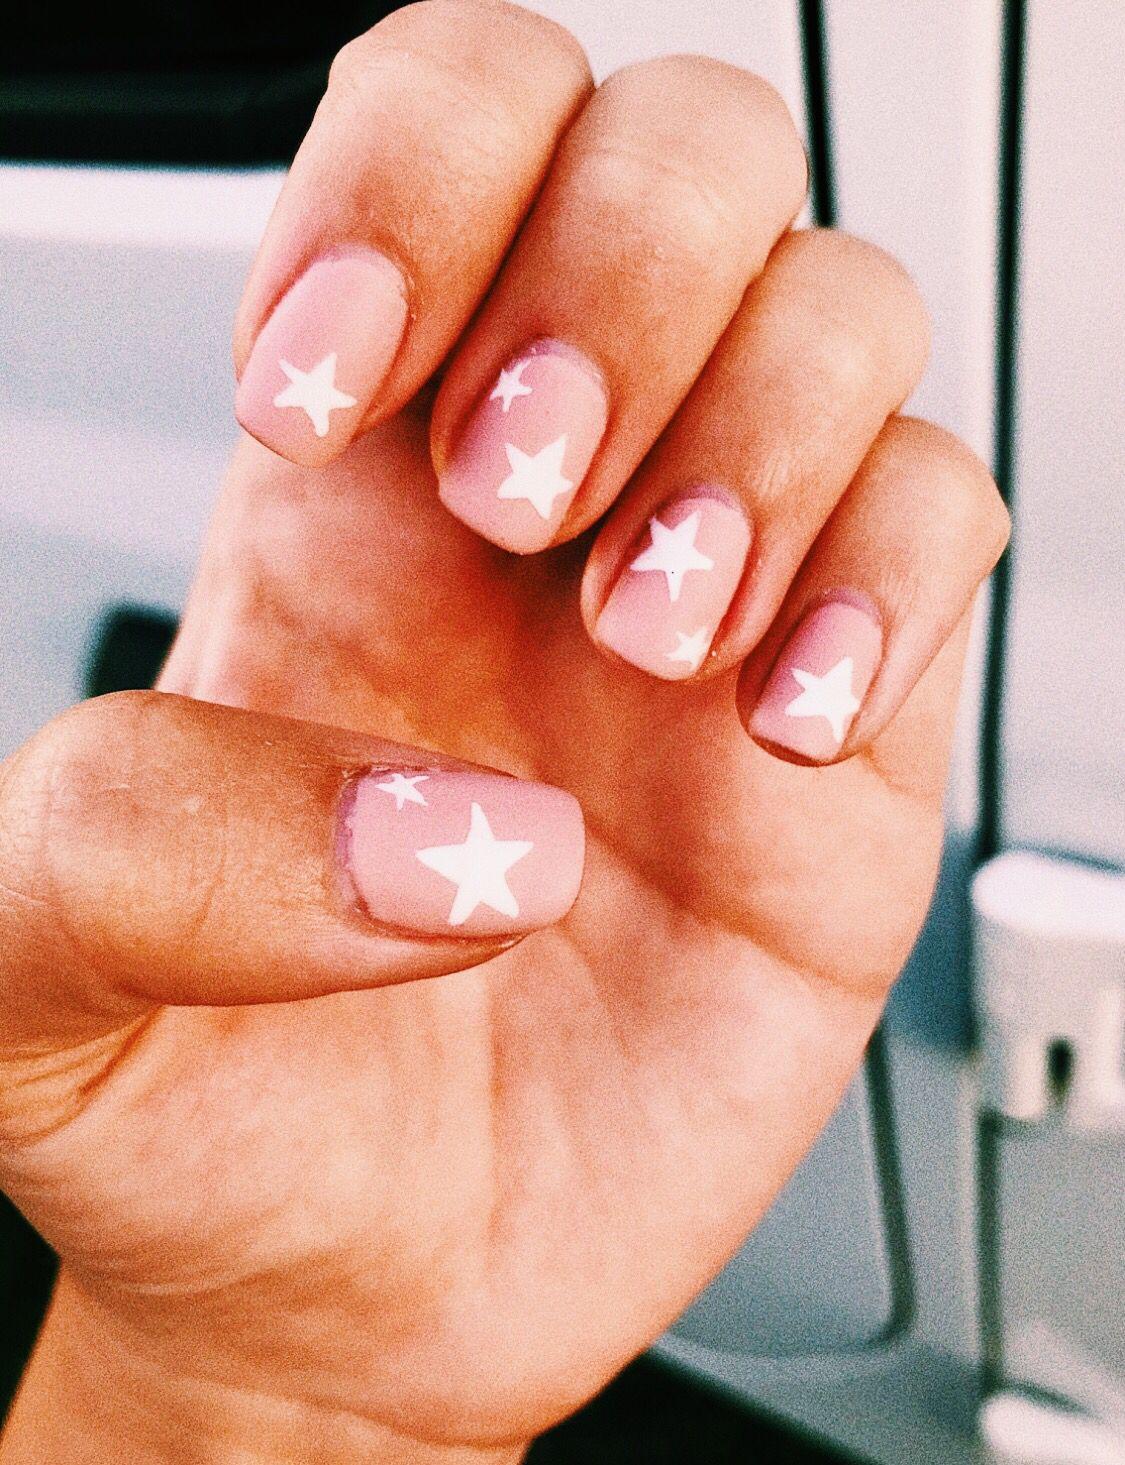 Pinterest Carolinefaith417 Cute Nails Star Nails Pretty Nails